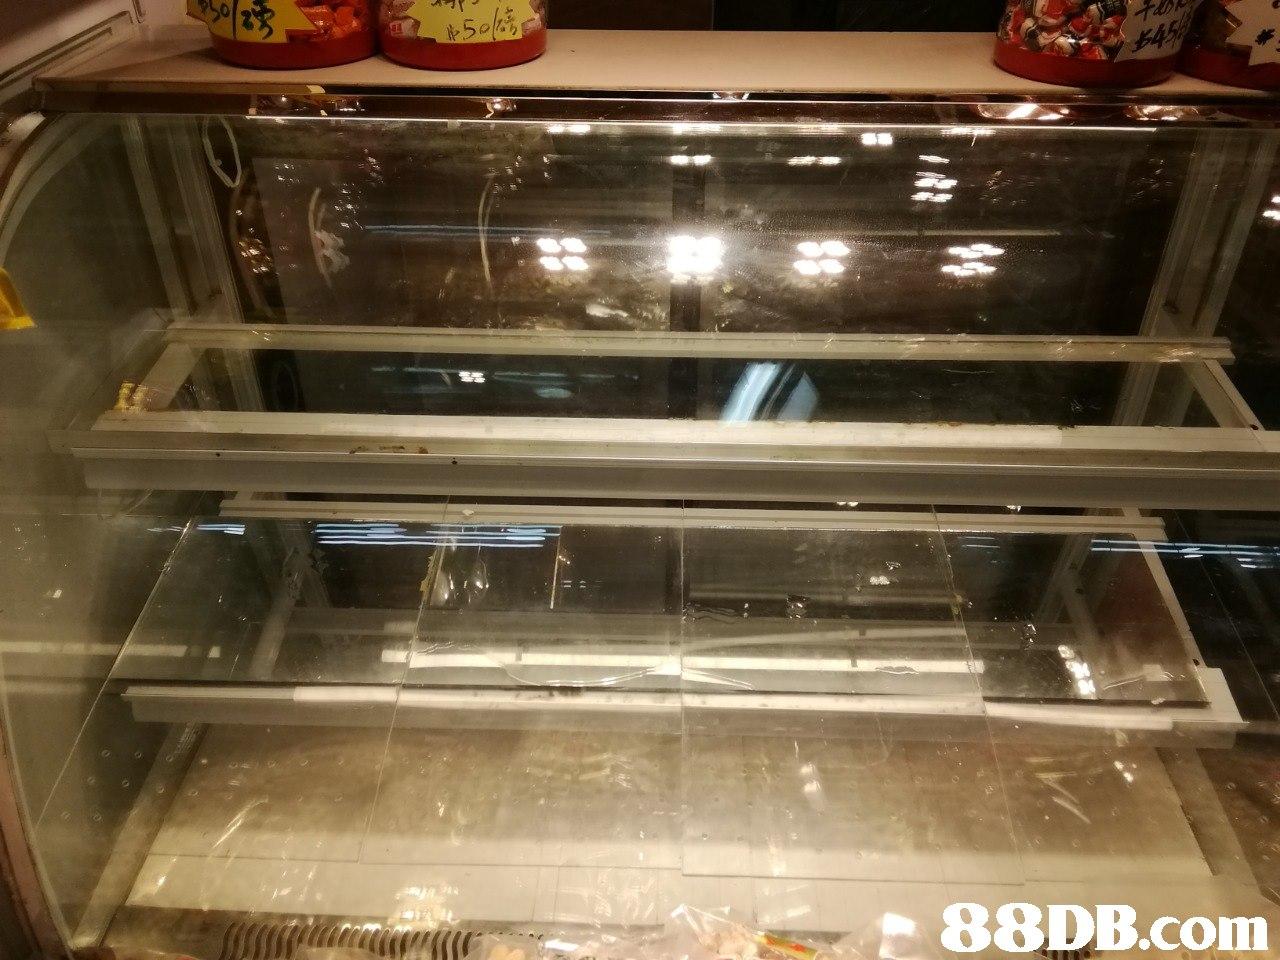 Refrigerator,Bakery,Kitchen appliance,Display case,Home appliance